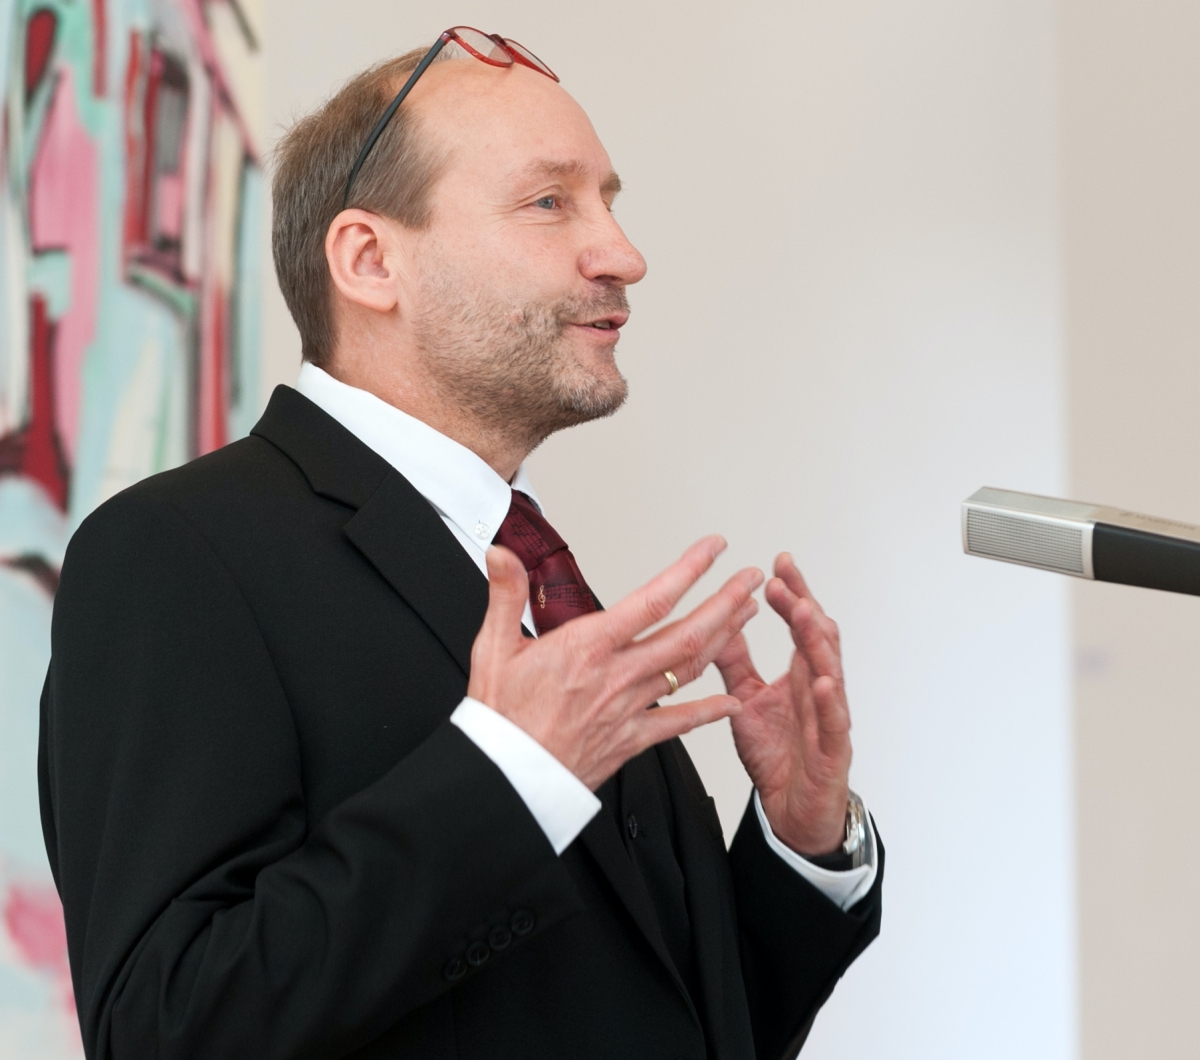 Ansprache Dr. Markus Heber